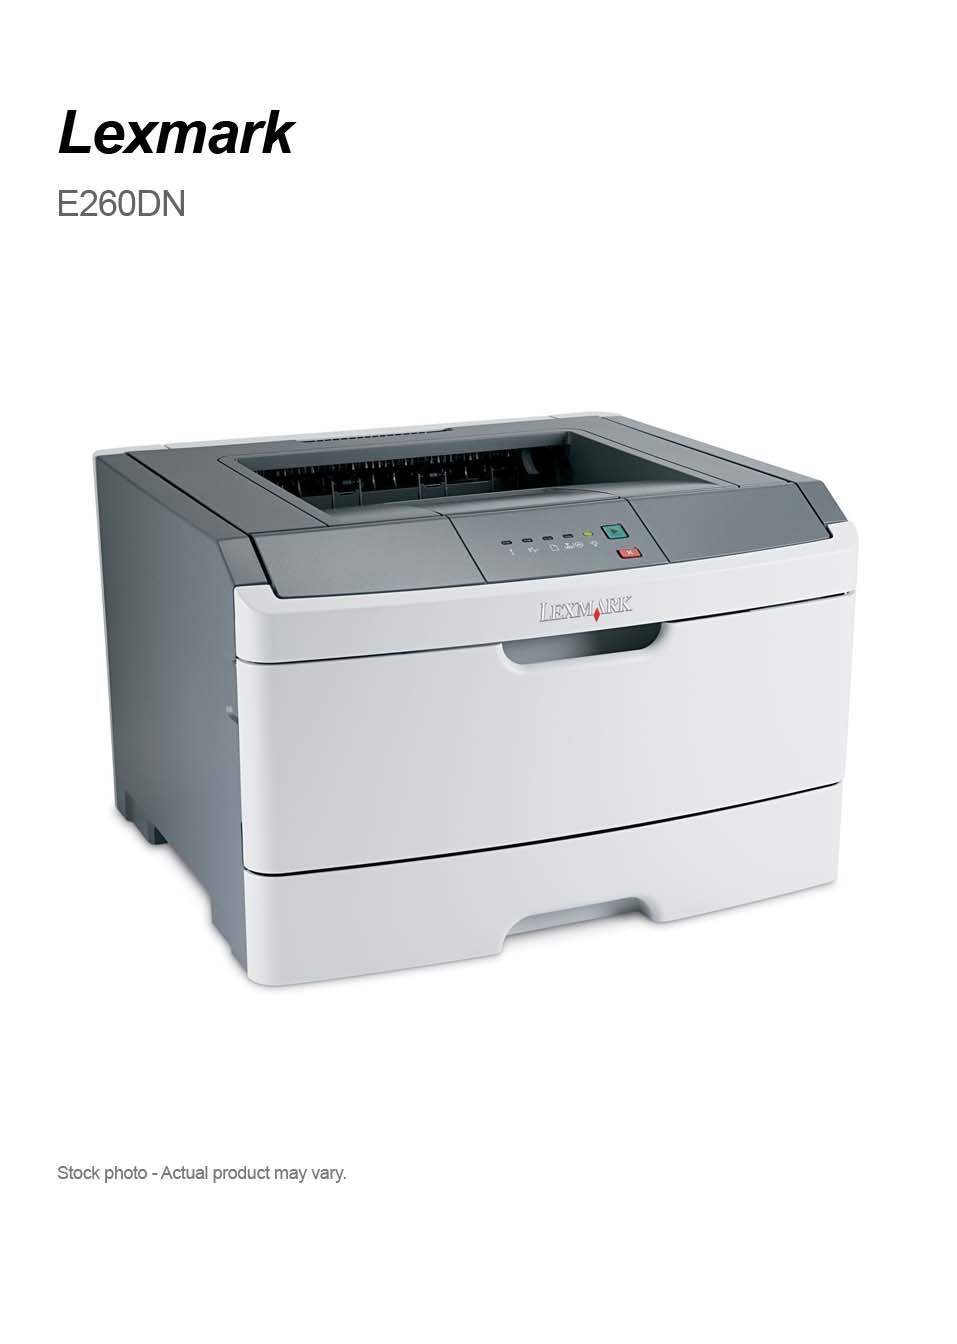 Lexmark MS312dn Network-Ready Monochrome Laser Printer ...